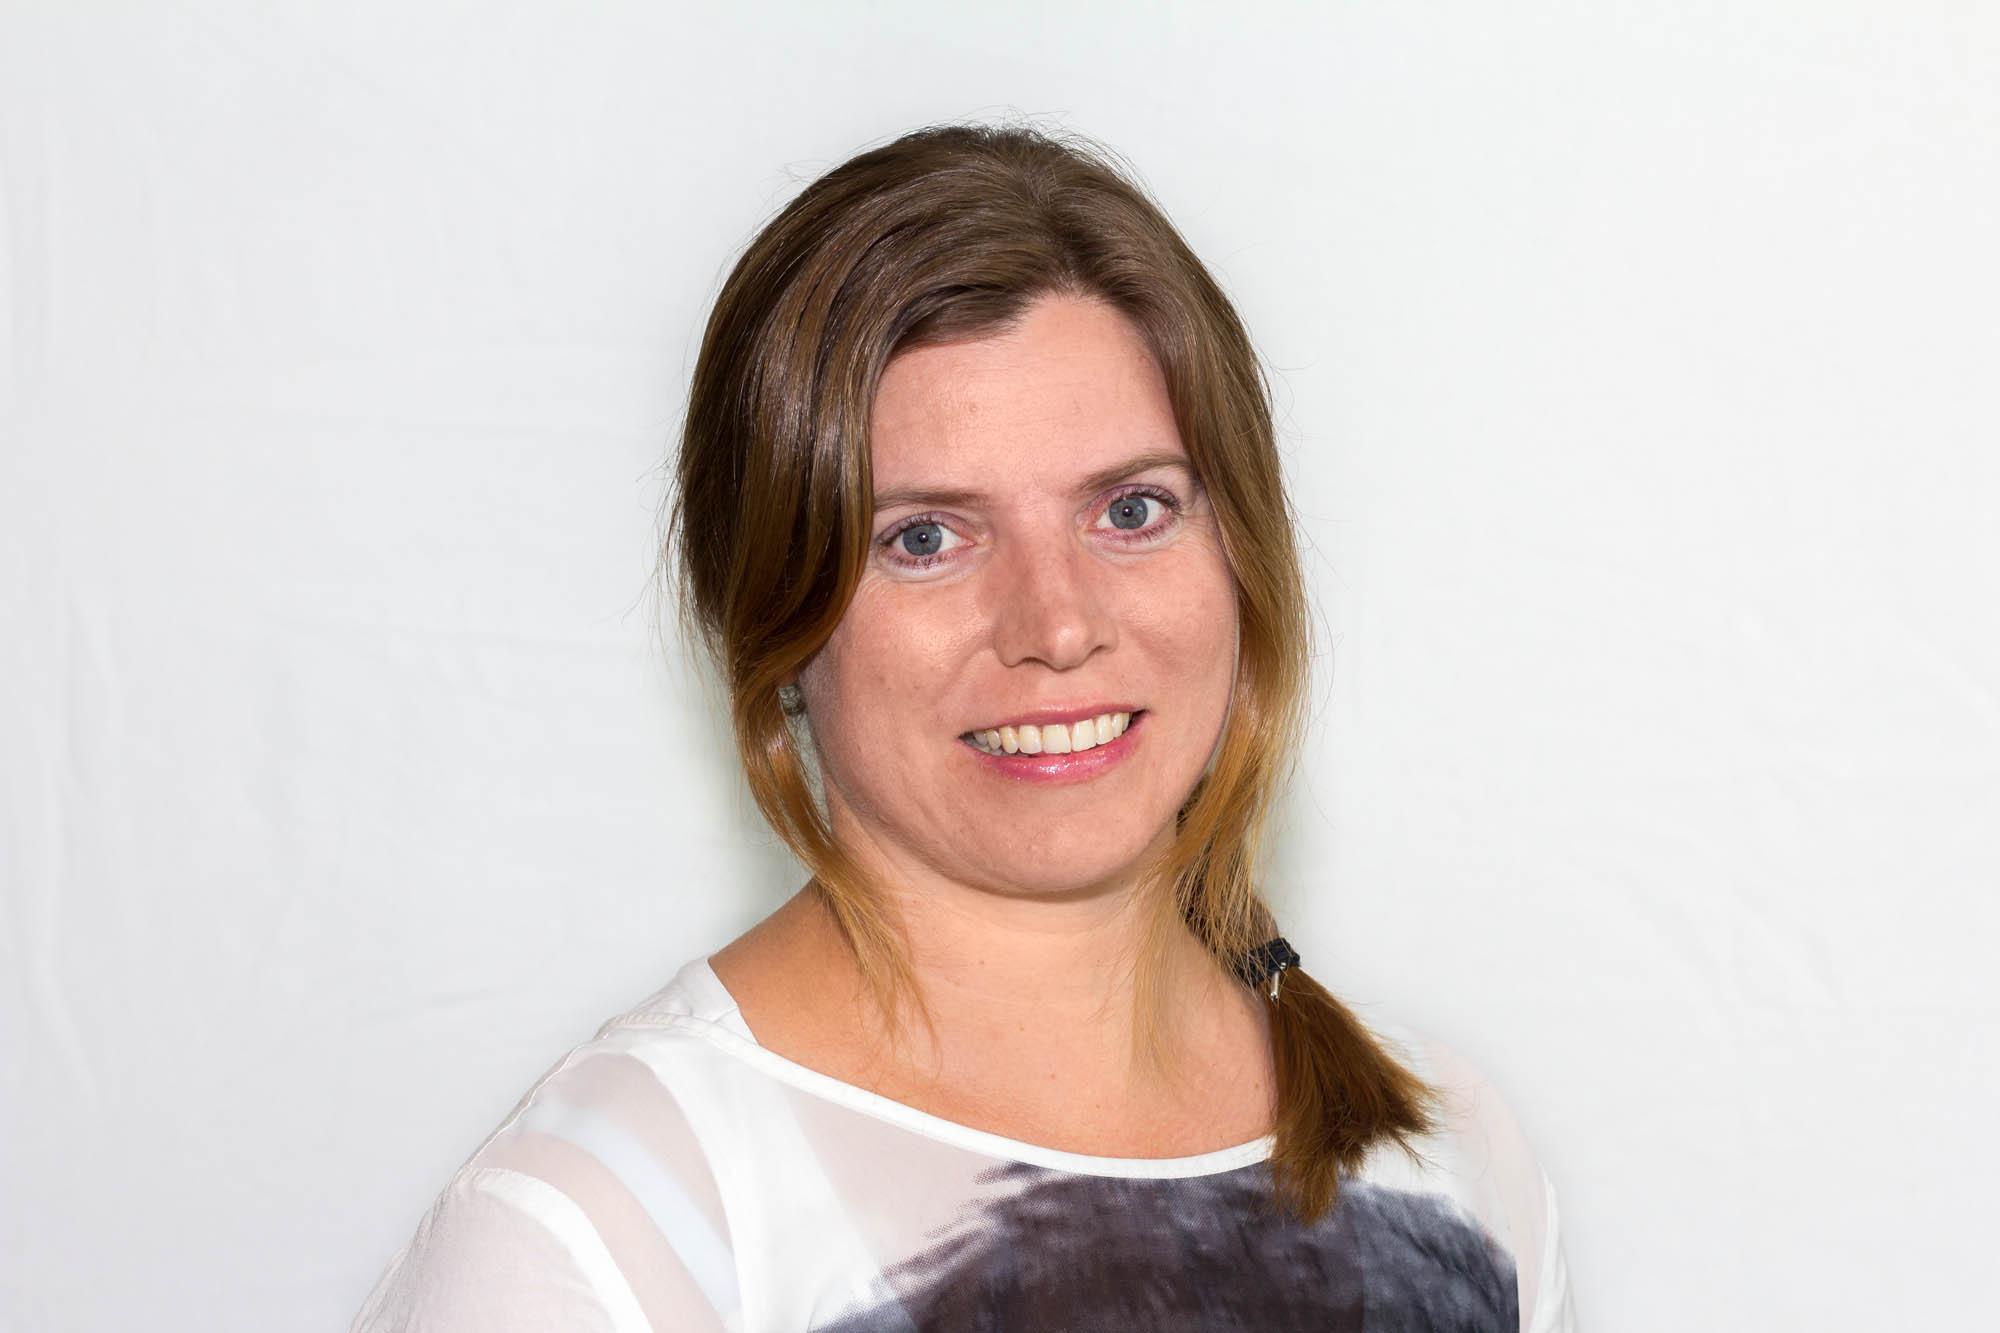 Larssen Møreforskning